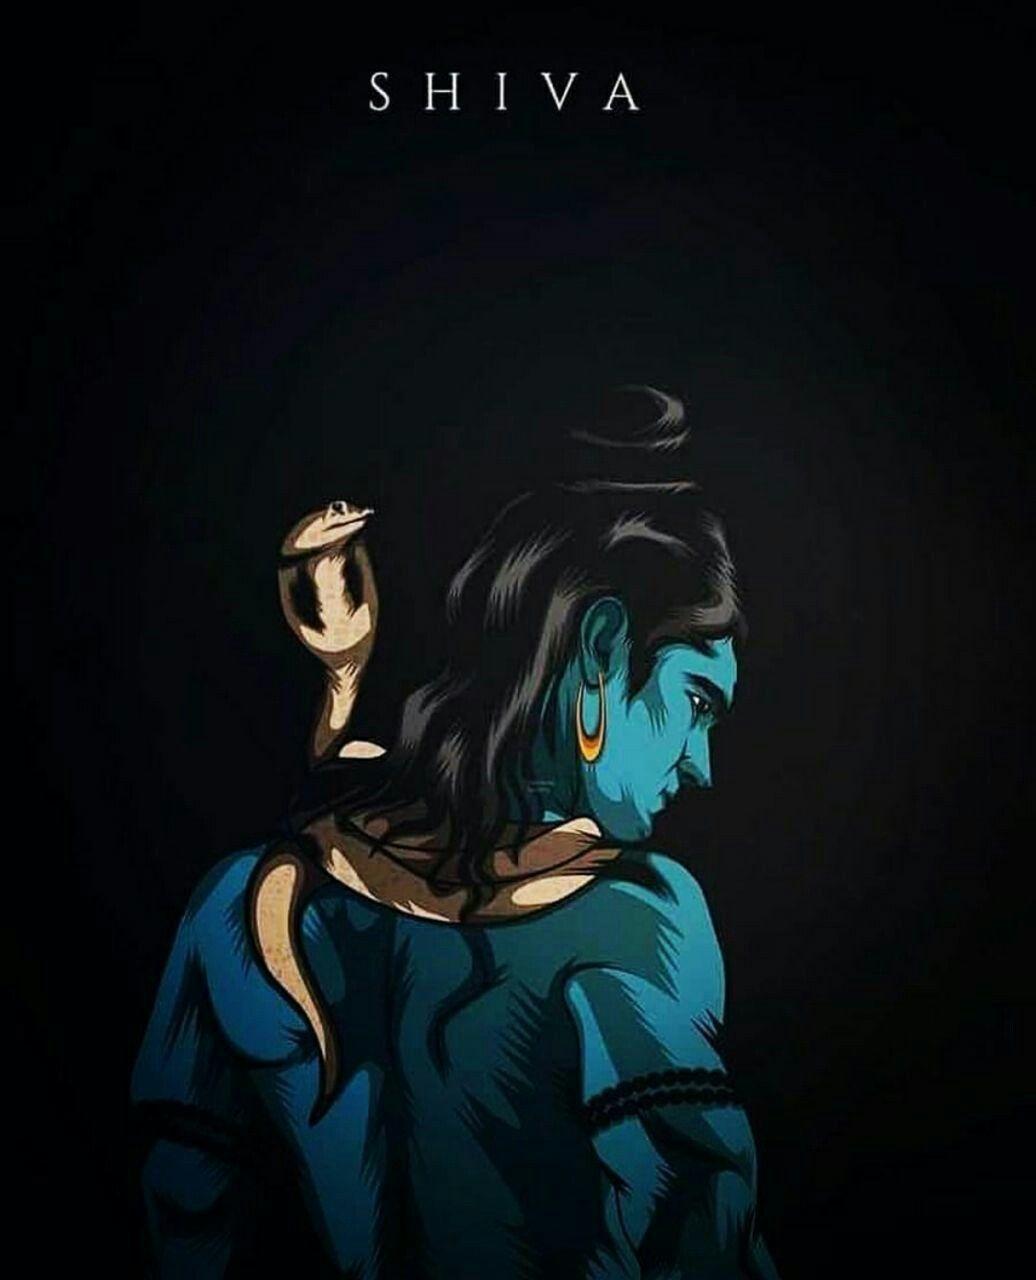 Pin By Paritosh Rawat On Shivadict Angry Lord Shiva Lord Shiva Painting Rudra Shiva